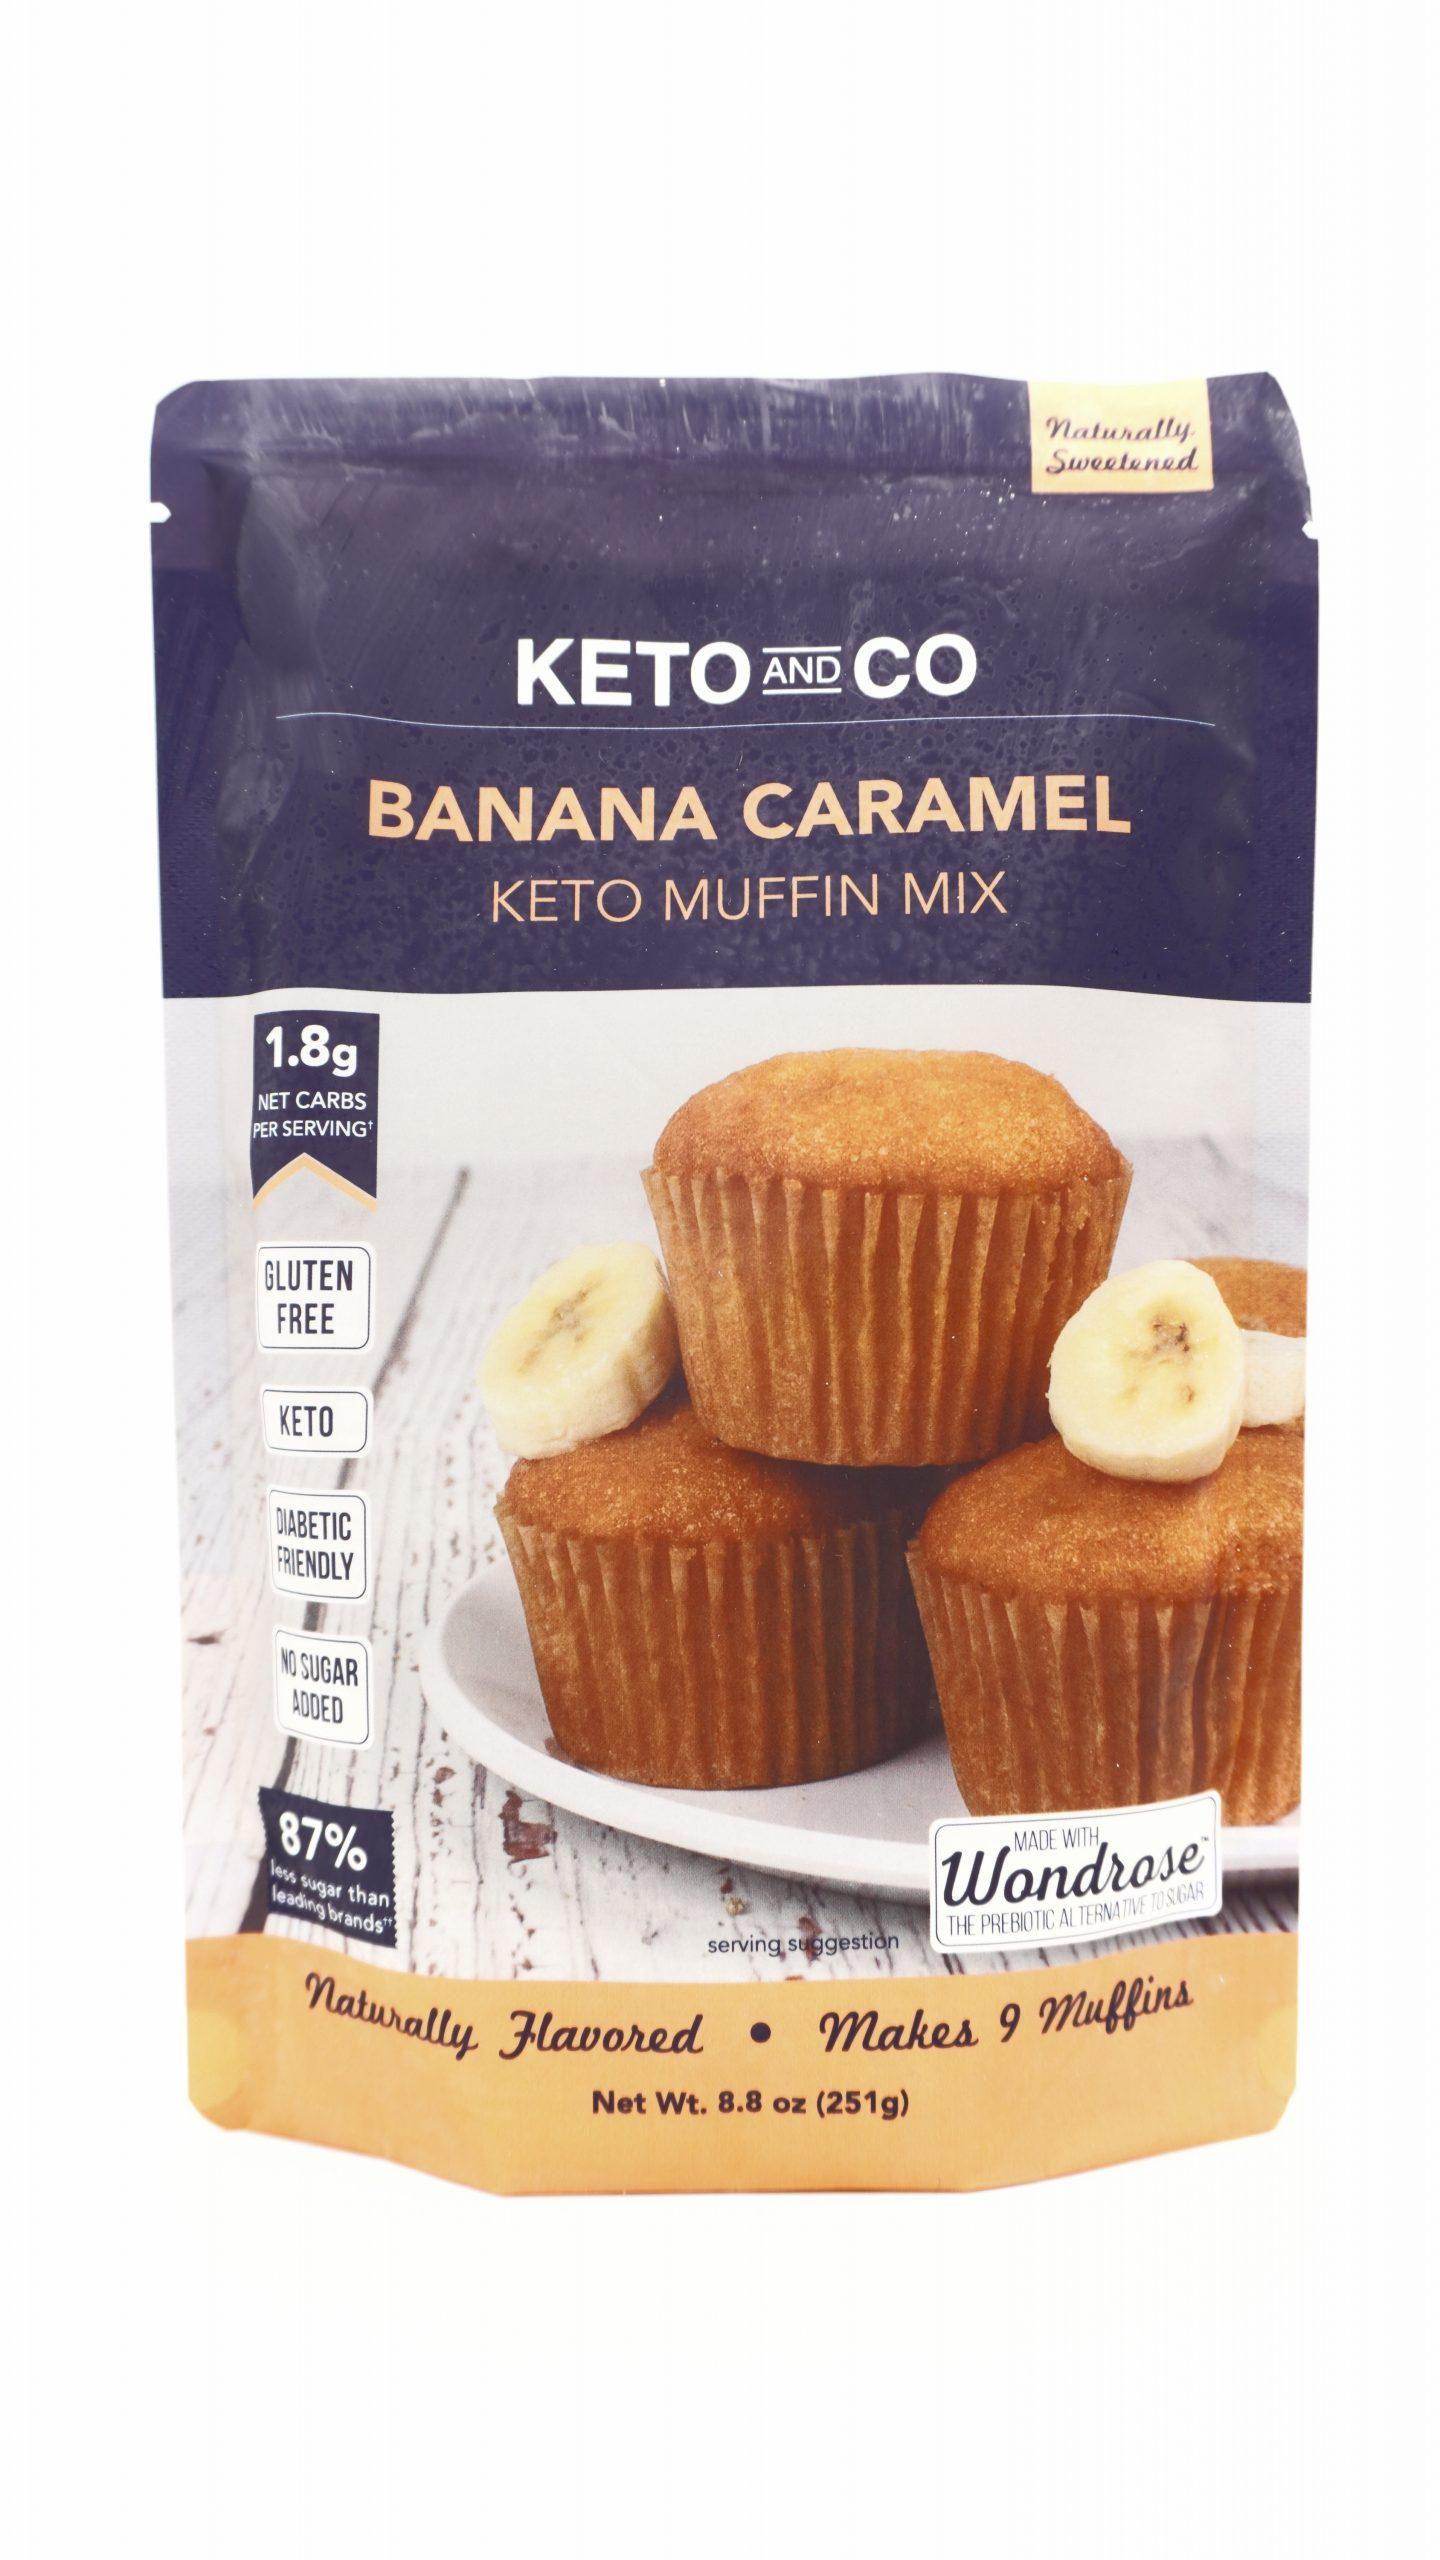 Keto & Co 生酮香蕉蛋糕杯預伴粉 251g